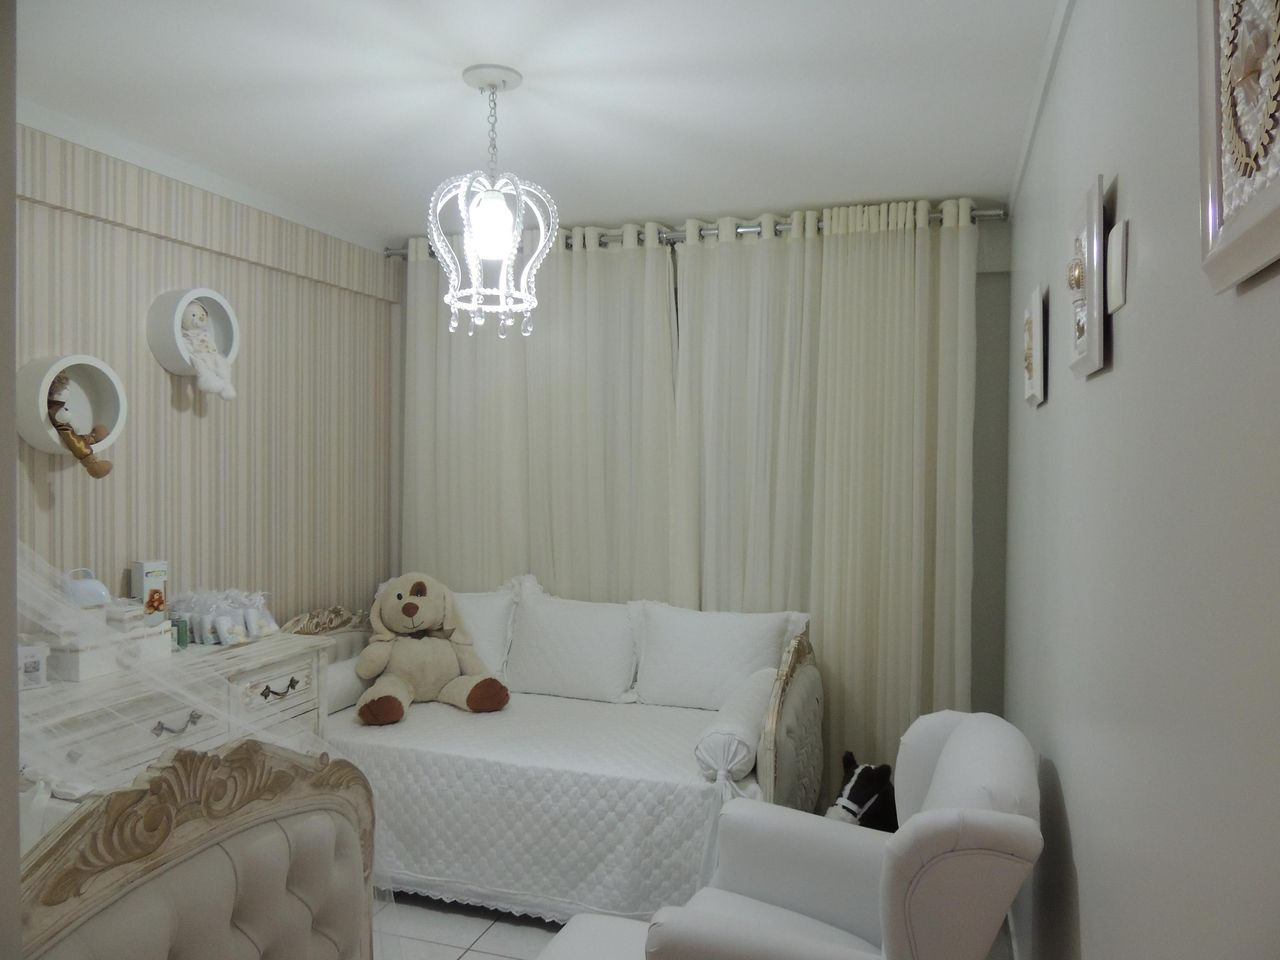 decoracao de quarto de bebe feminino neutro janaina aristides de moura 35276